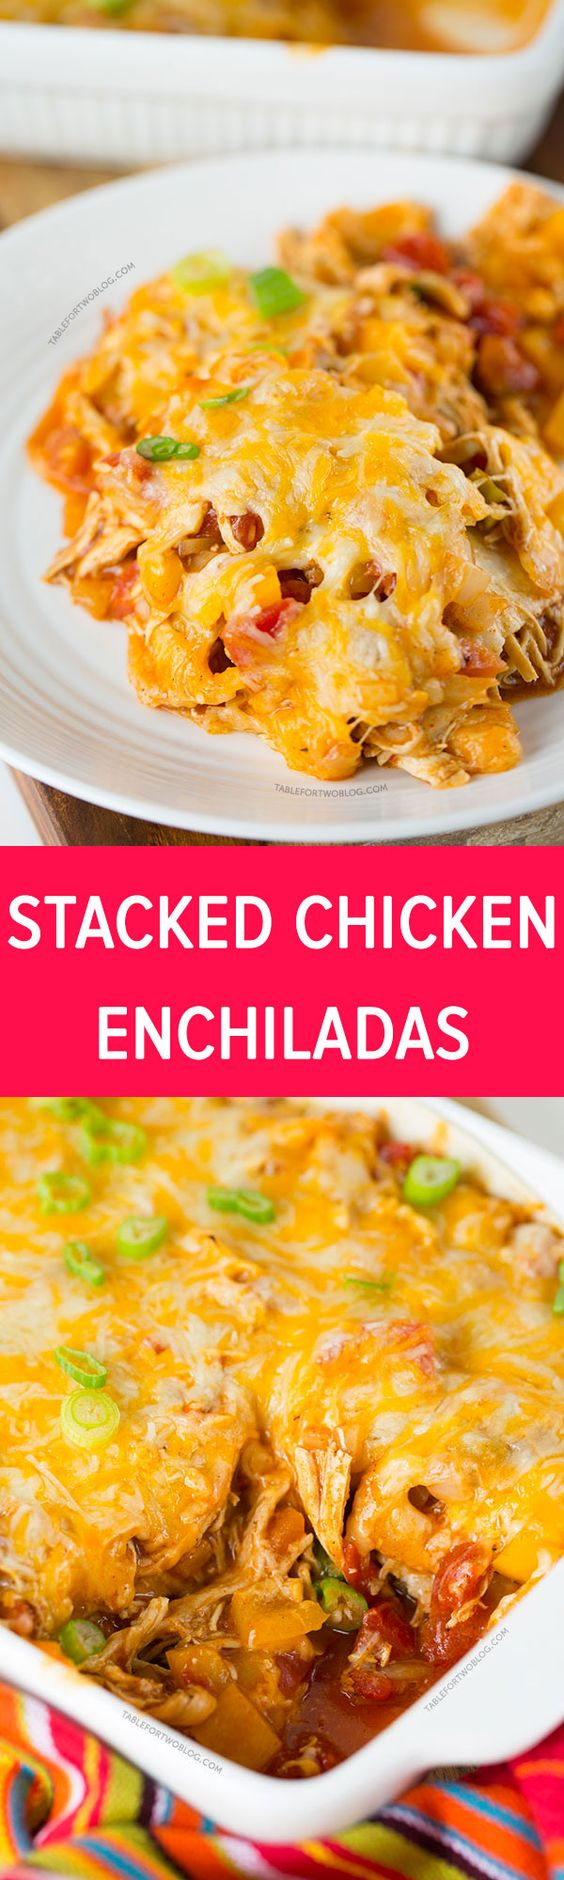 Stacked Chicken Enchiladas | Recipe | The o'jays, Enchiladas and ...